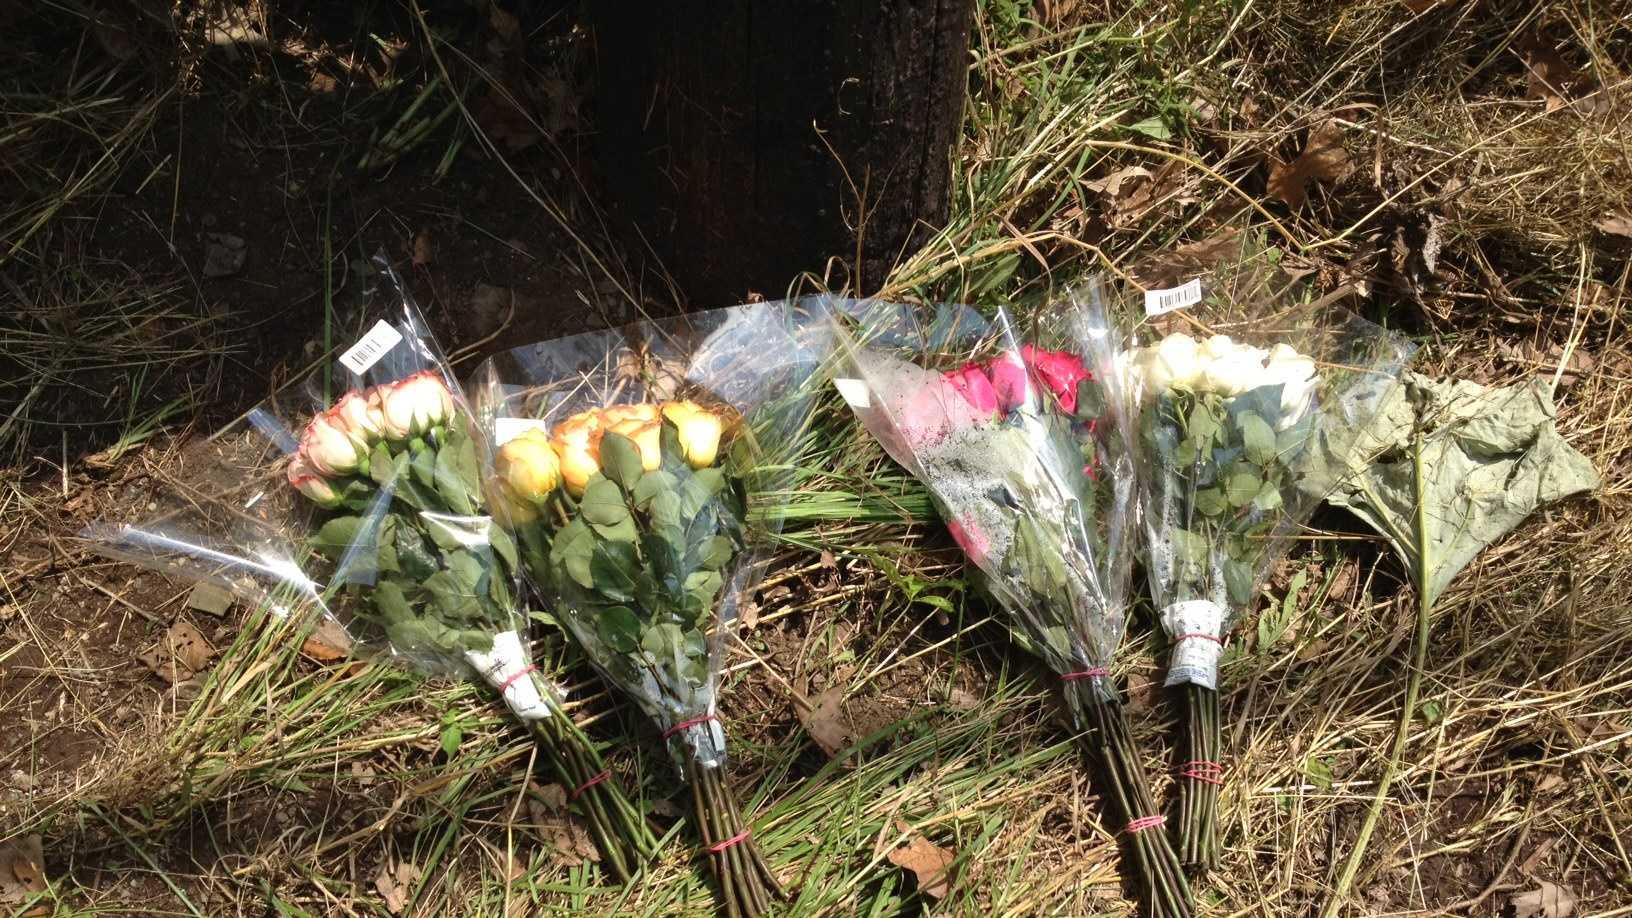 Collier Township crash scene